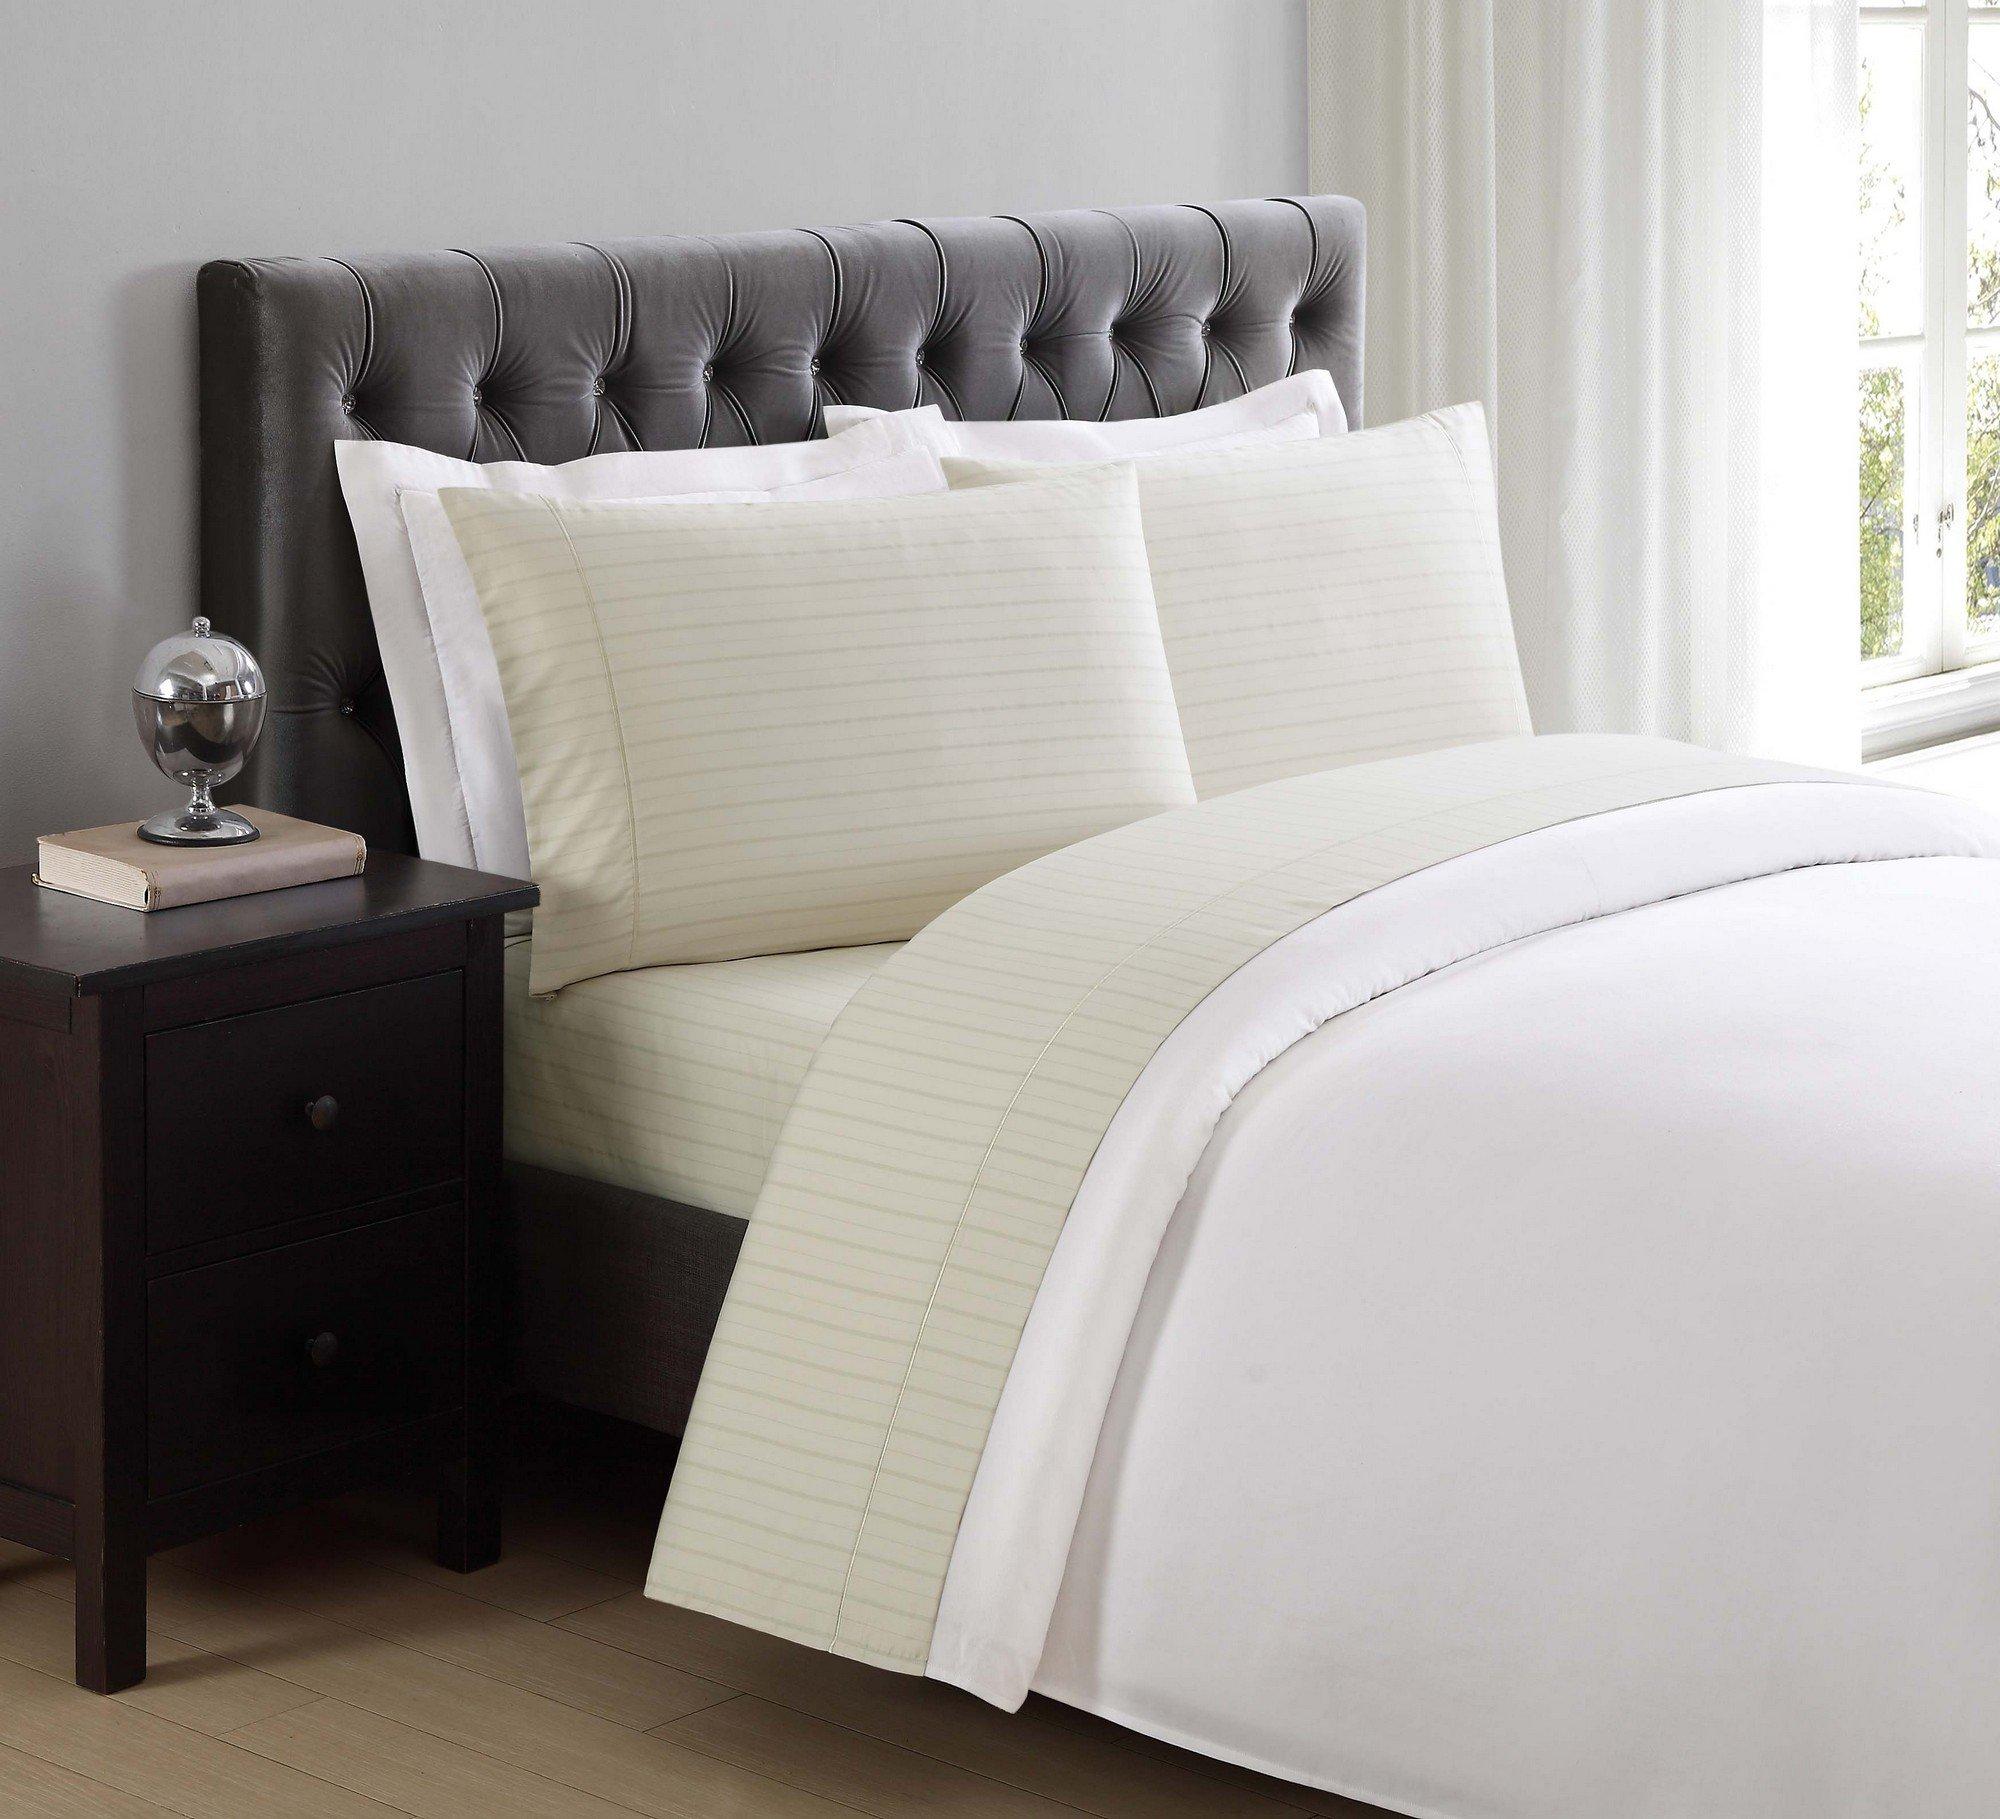 Charisma 310 Thread Count Classic Stripe Cotton Sateen Full Sheet Set in Almond Milk